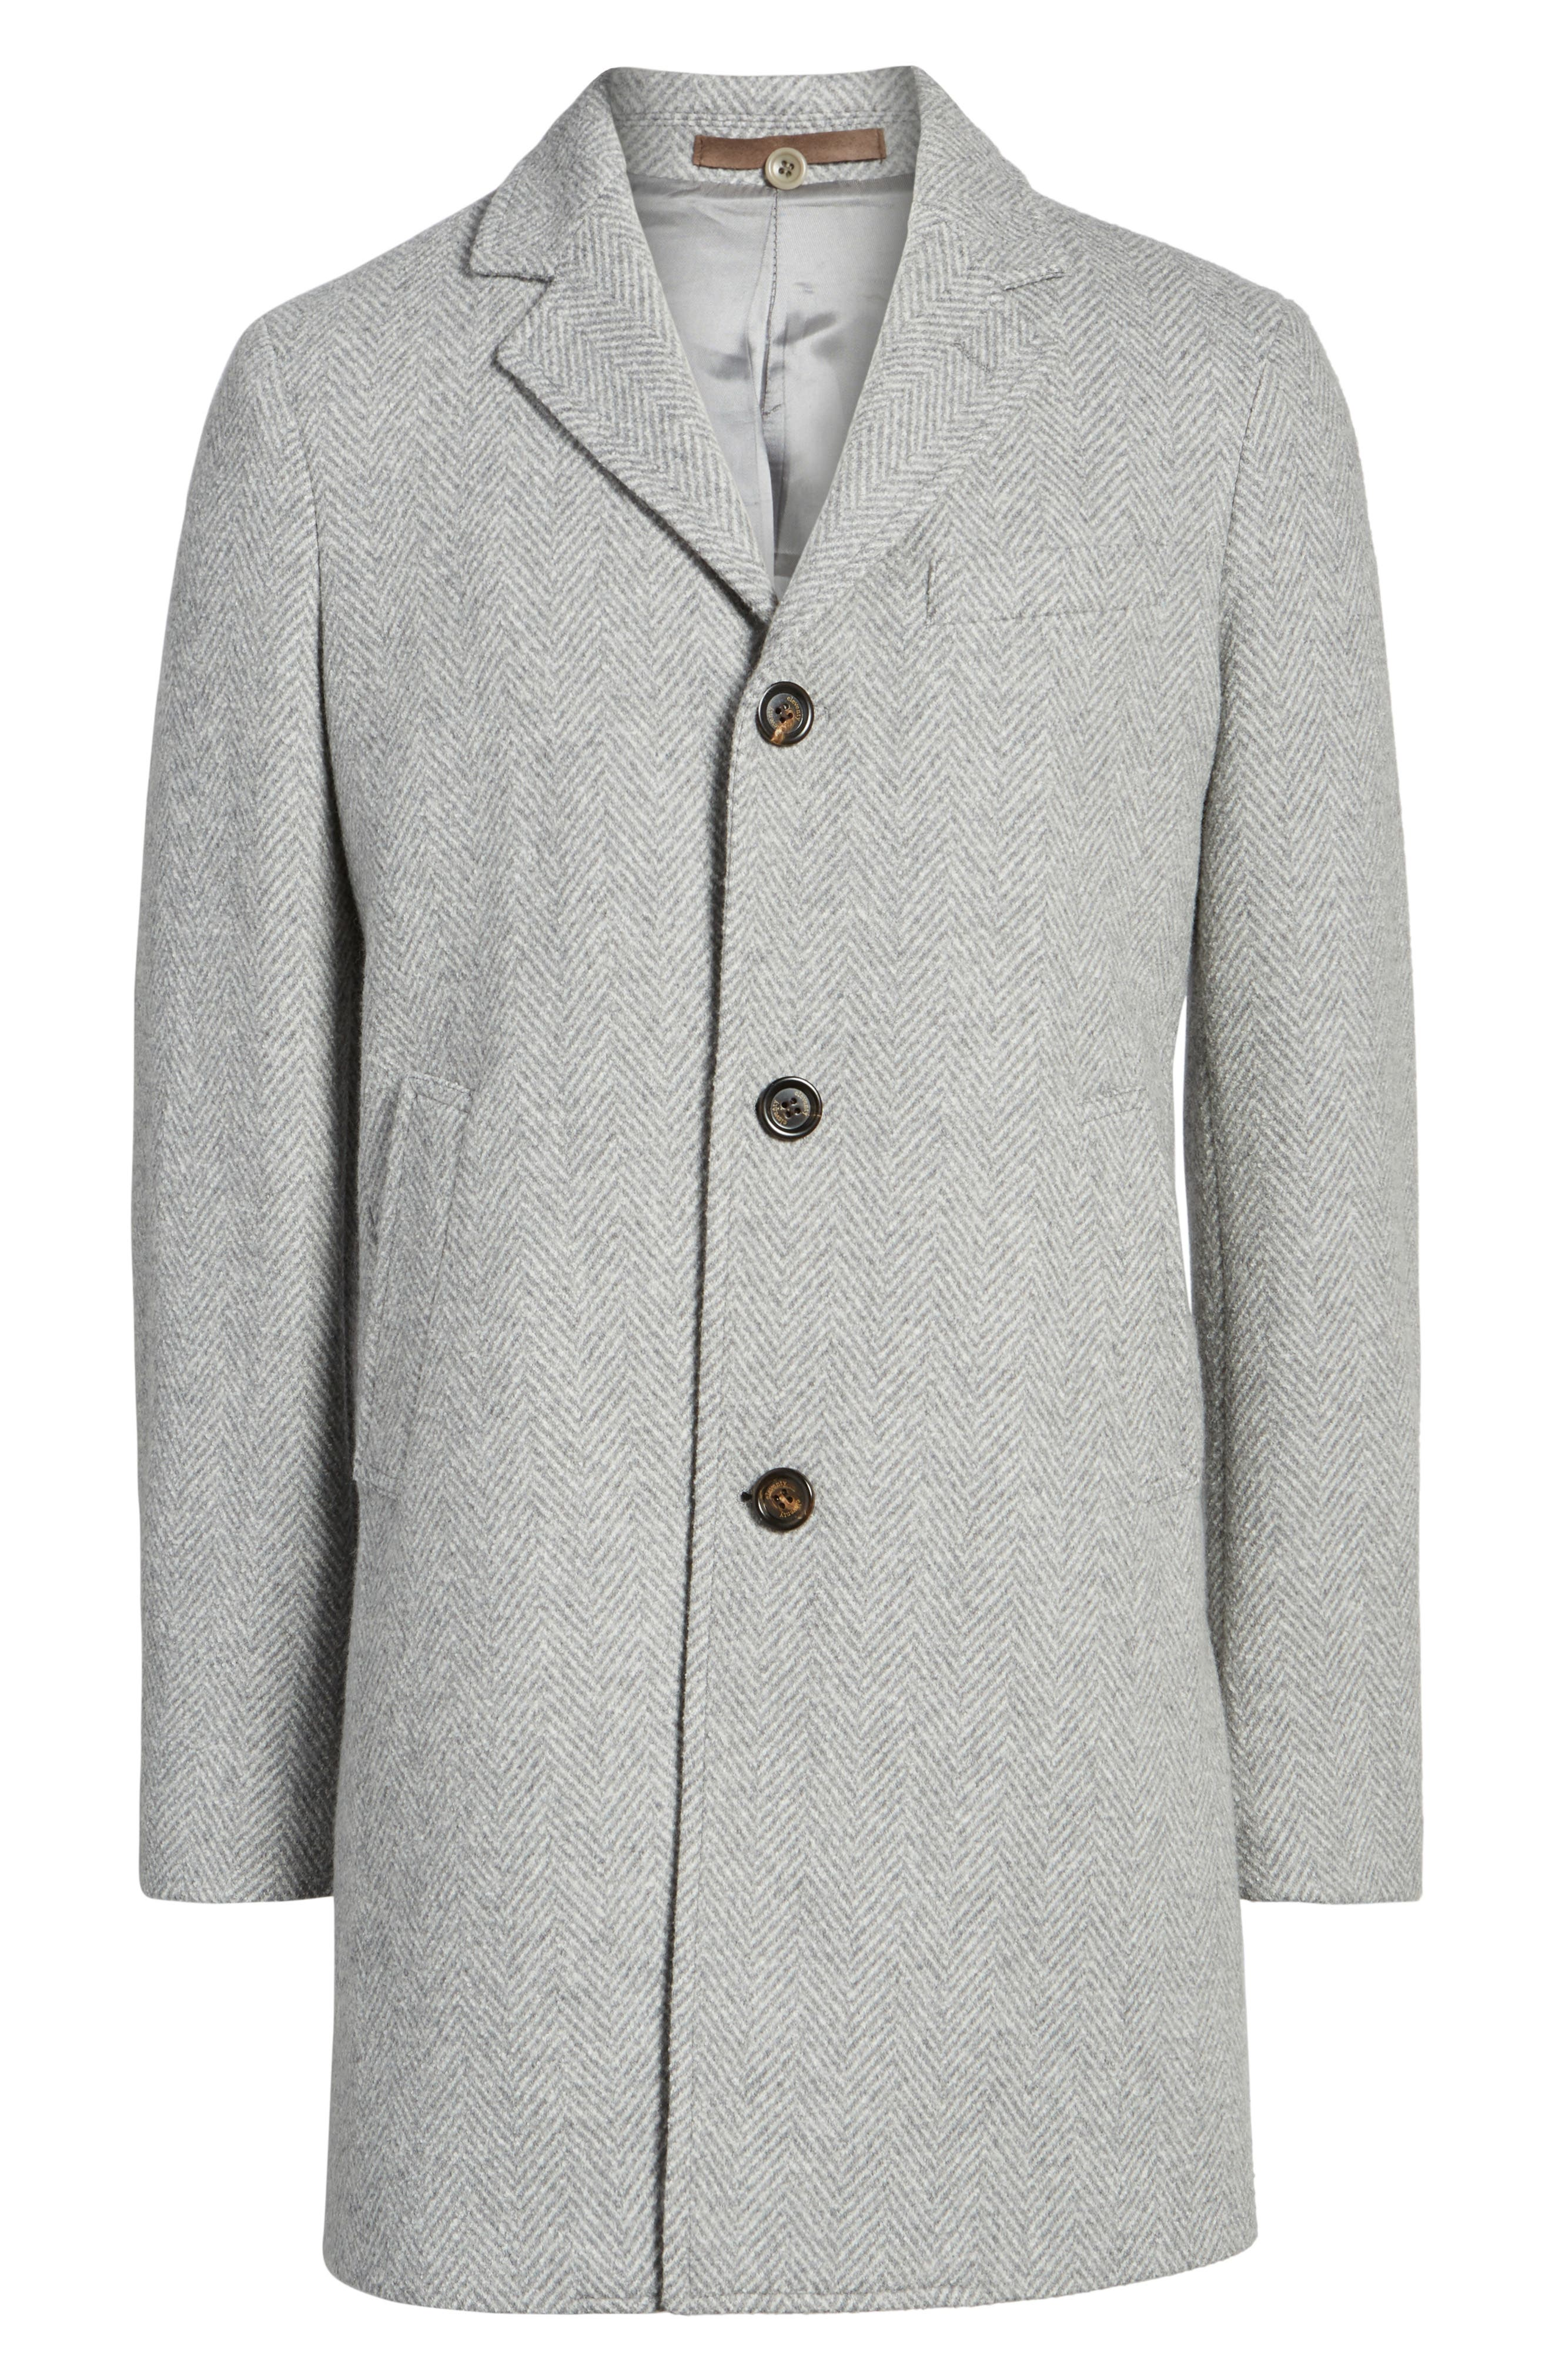 Herringbone Wool Blend Overcoat,                             Alternate thumbnail 5, color,